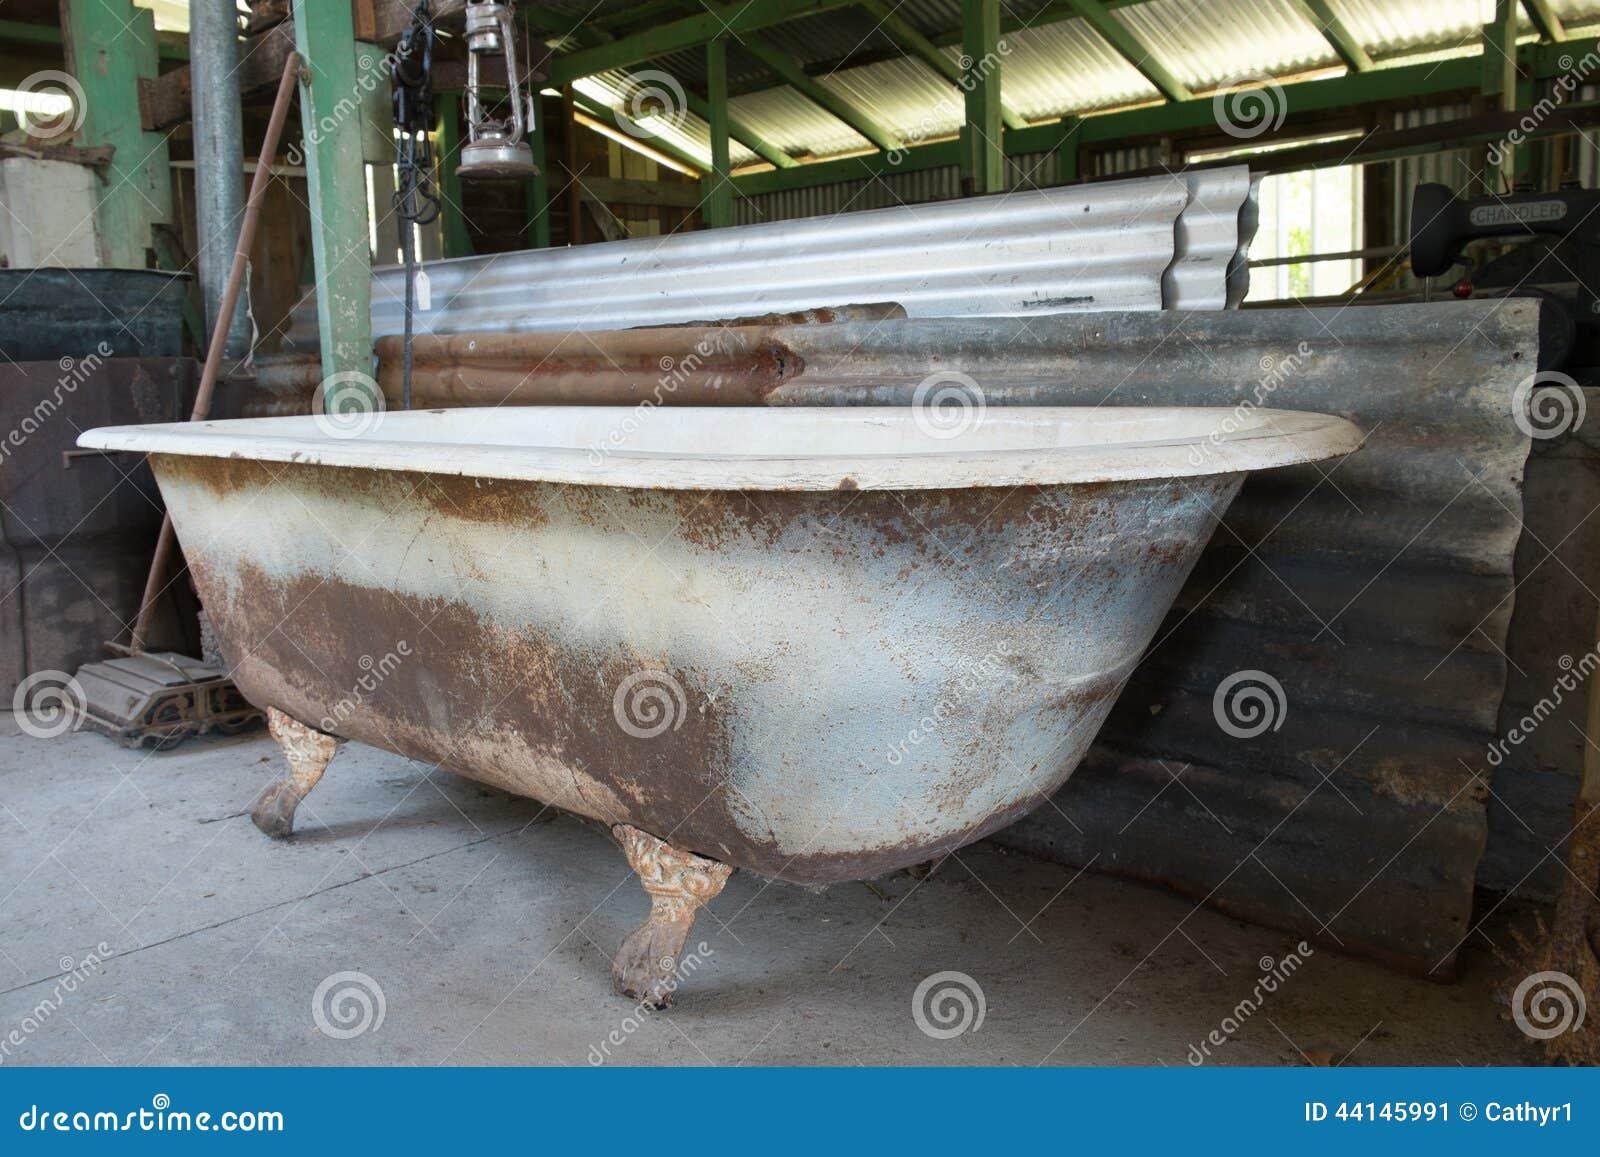 Vasca Da Bagno Arrugginita : Vecchia vasca arrugginita immagine stock immagine di piede